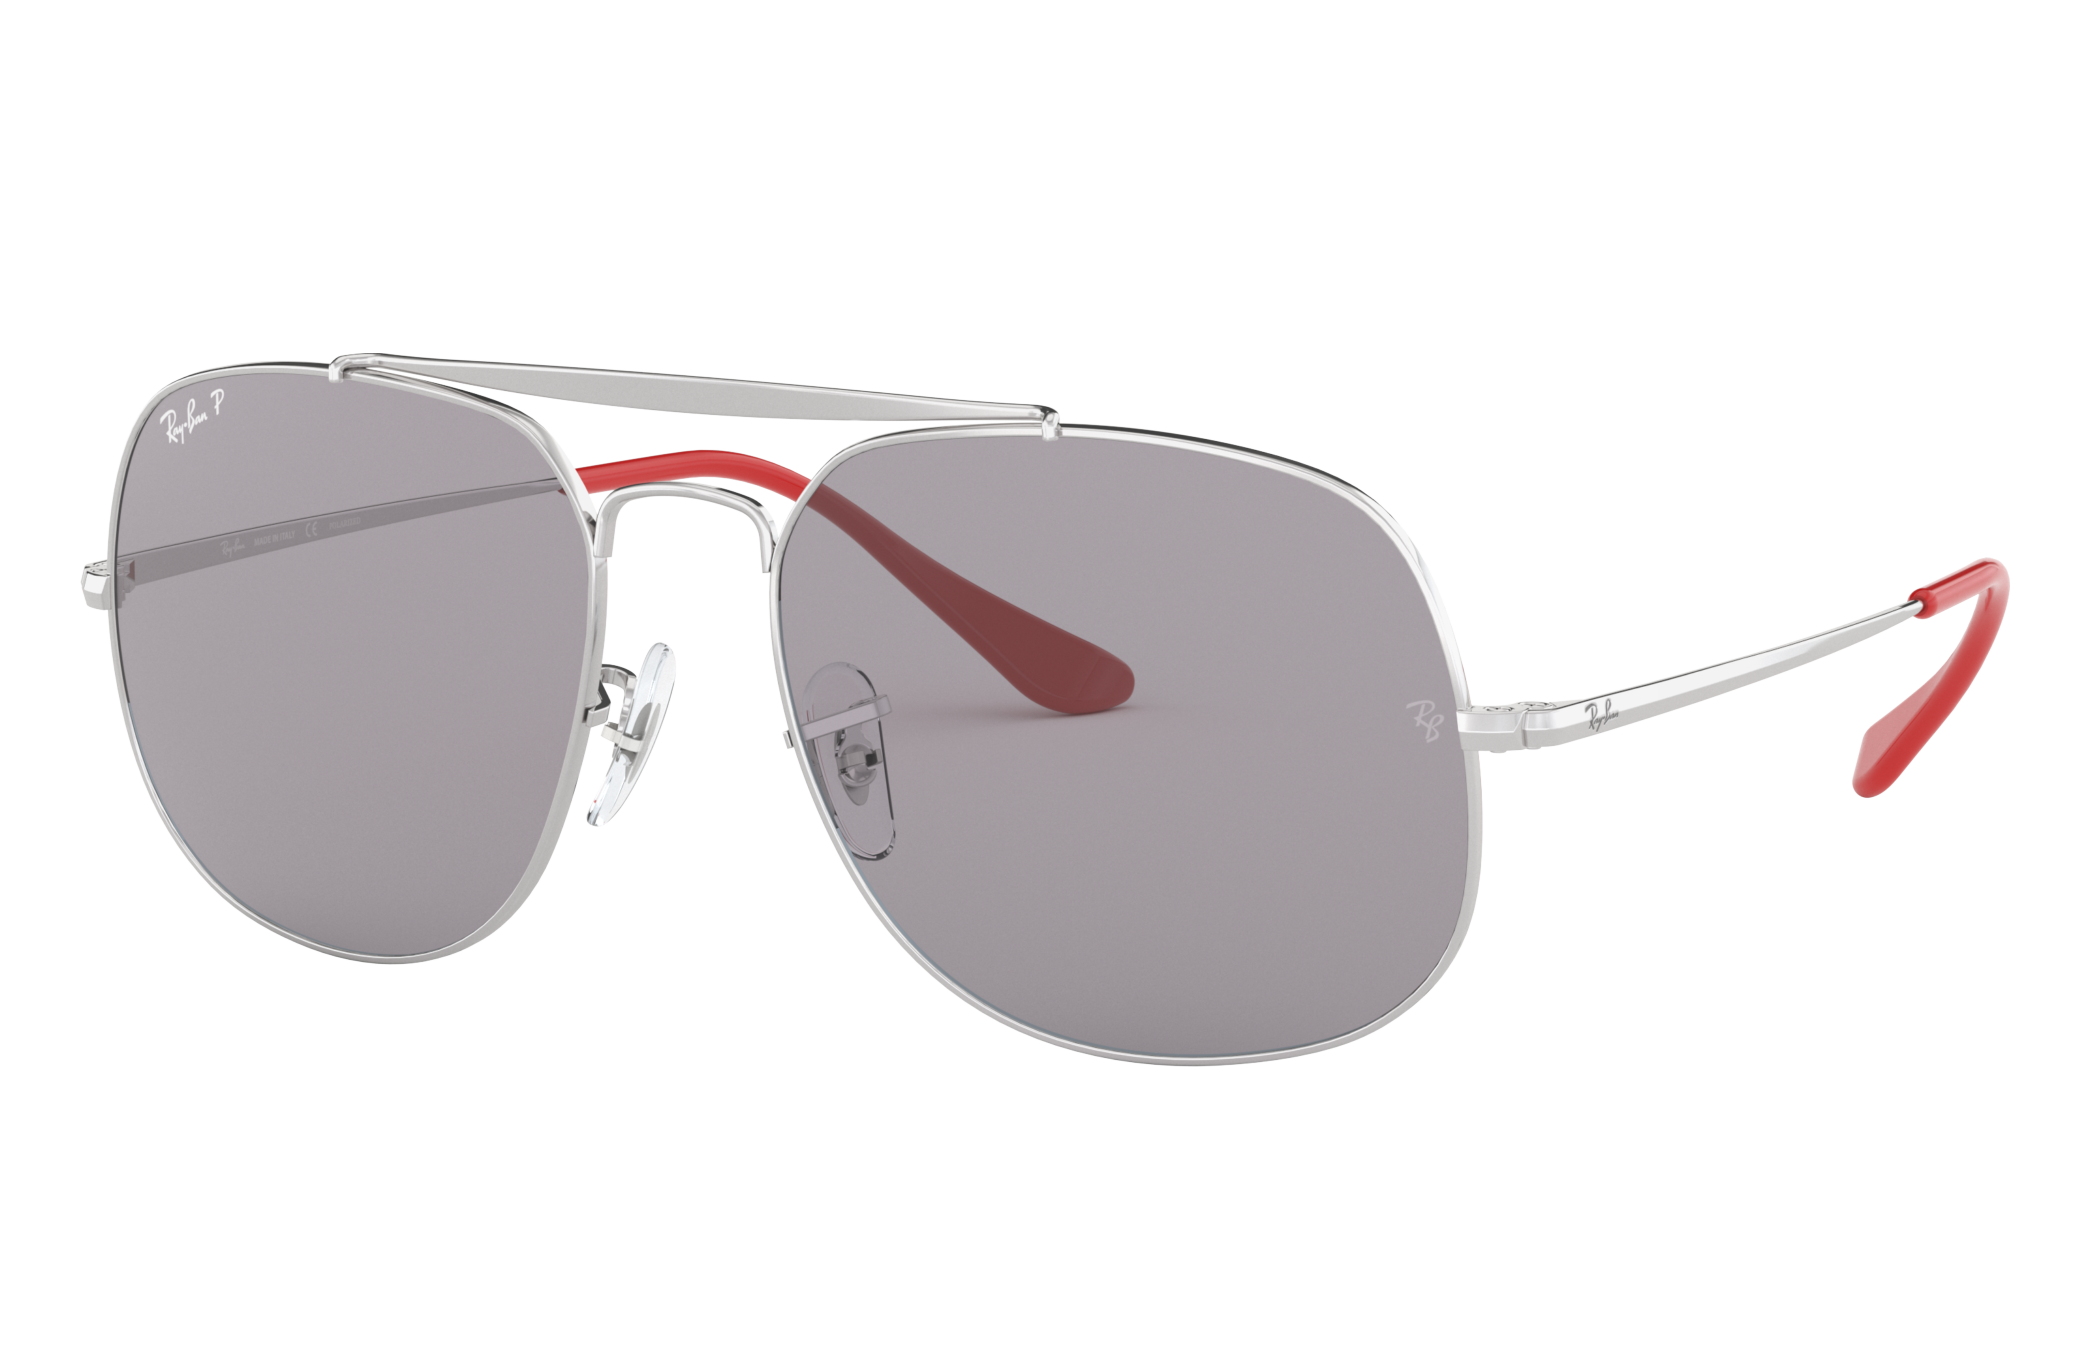 Ray-Ban General Pop Silver, Polarized Grey Lenses - RB3561